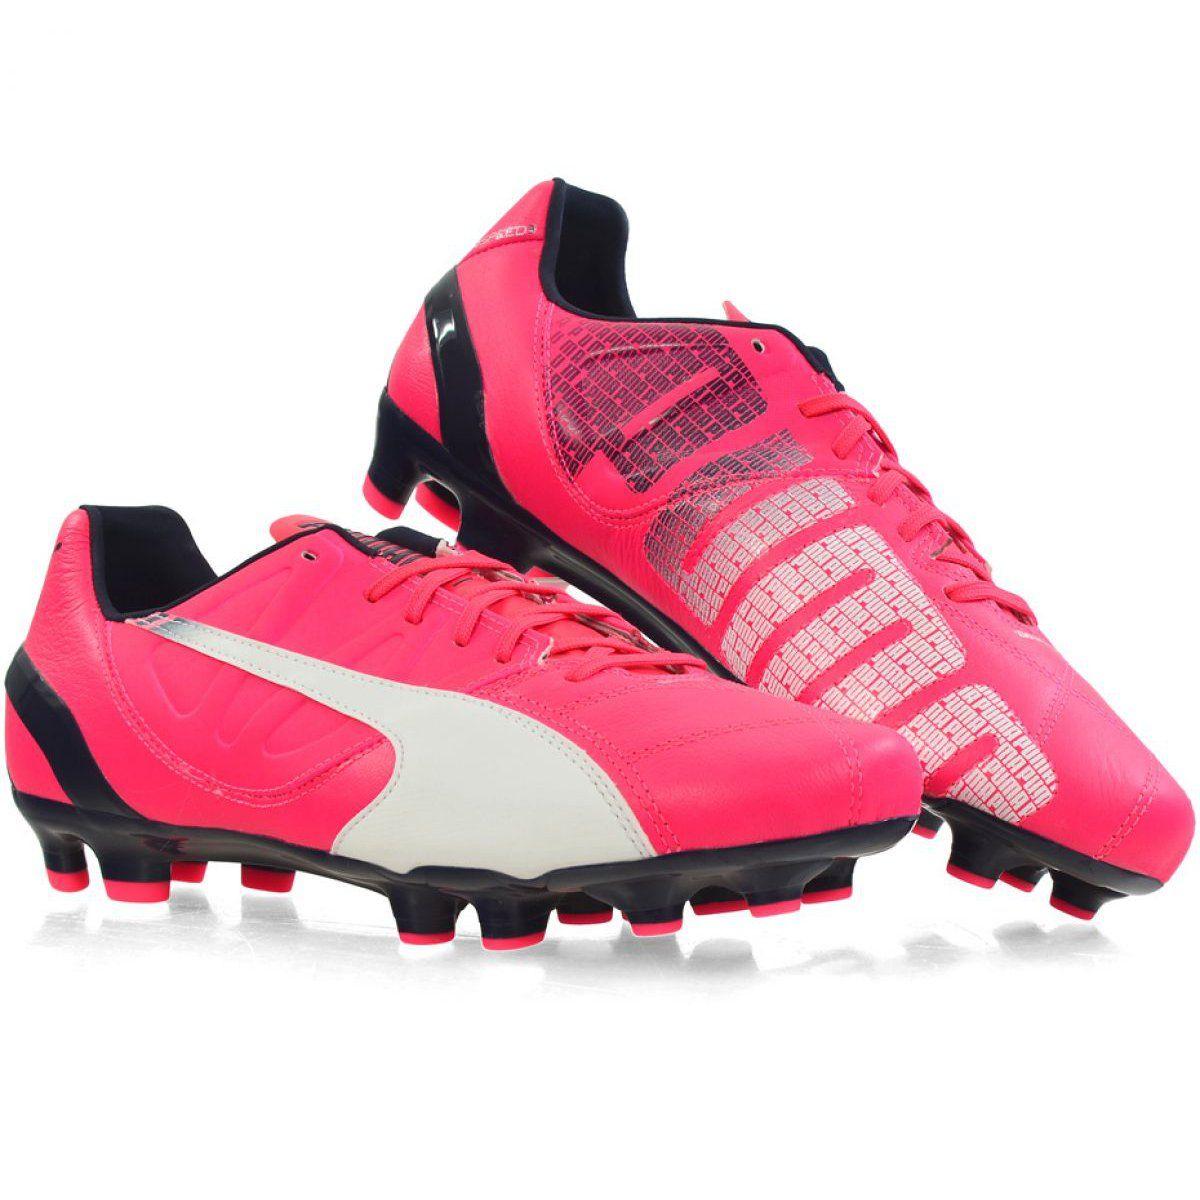 Buty Pilkarskie Puma Evo Speed 3 3 Fg M 103014 03 Rozowe Rozowe Nike Air Max Sneakers Nike Sport Shoes